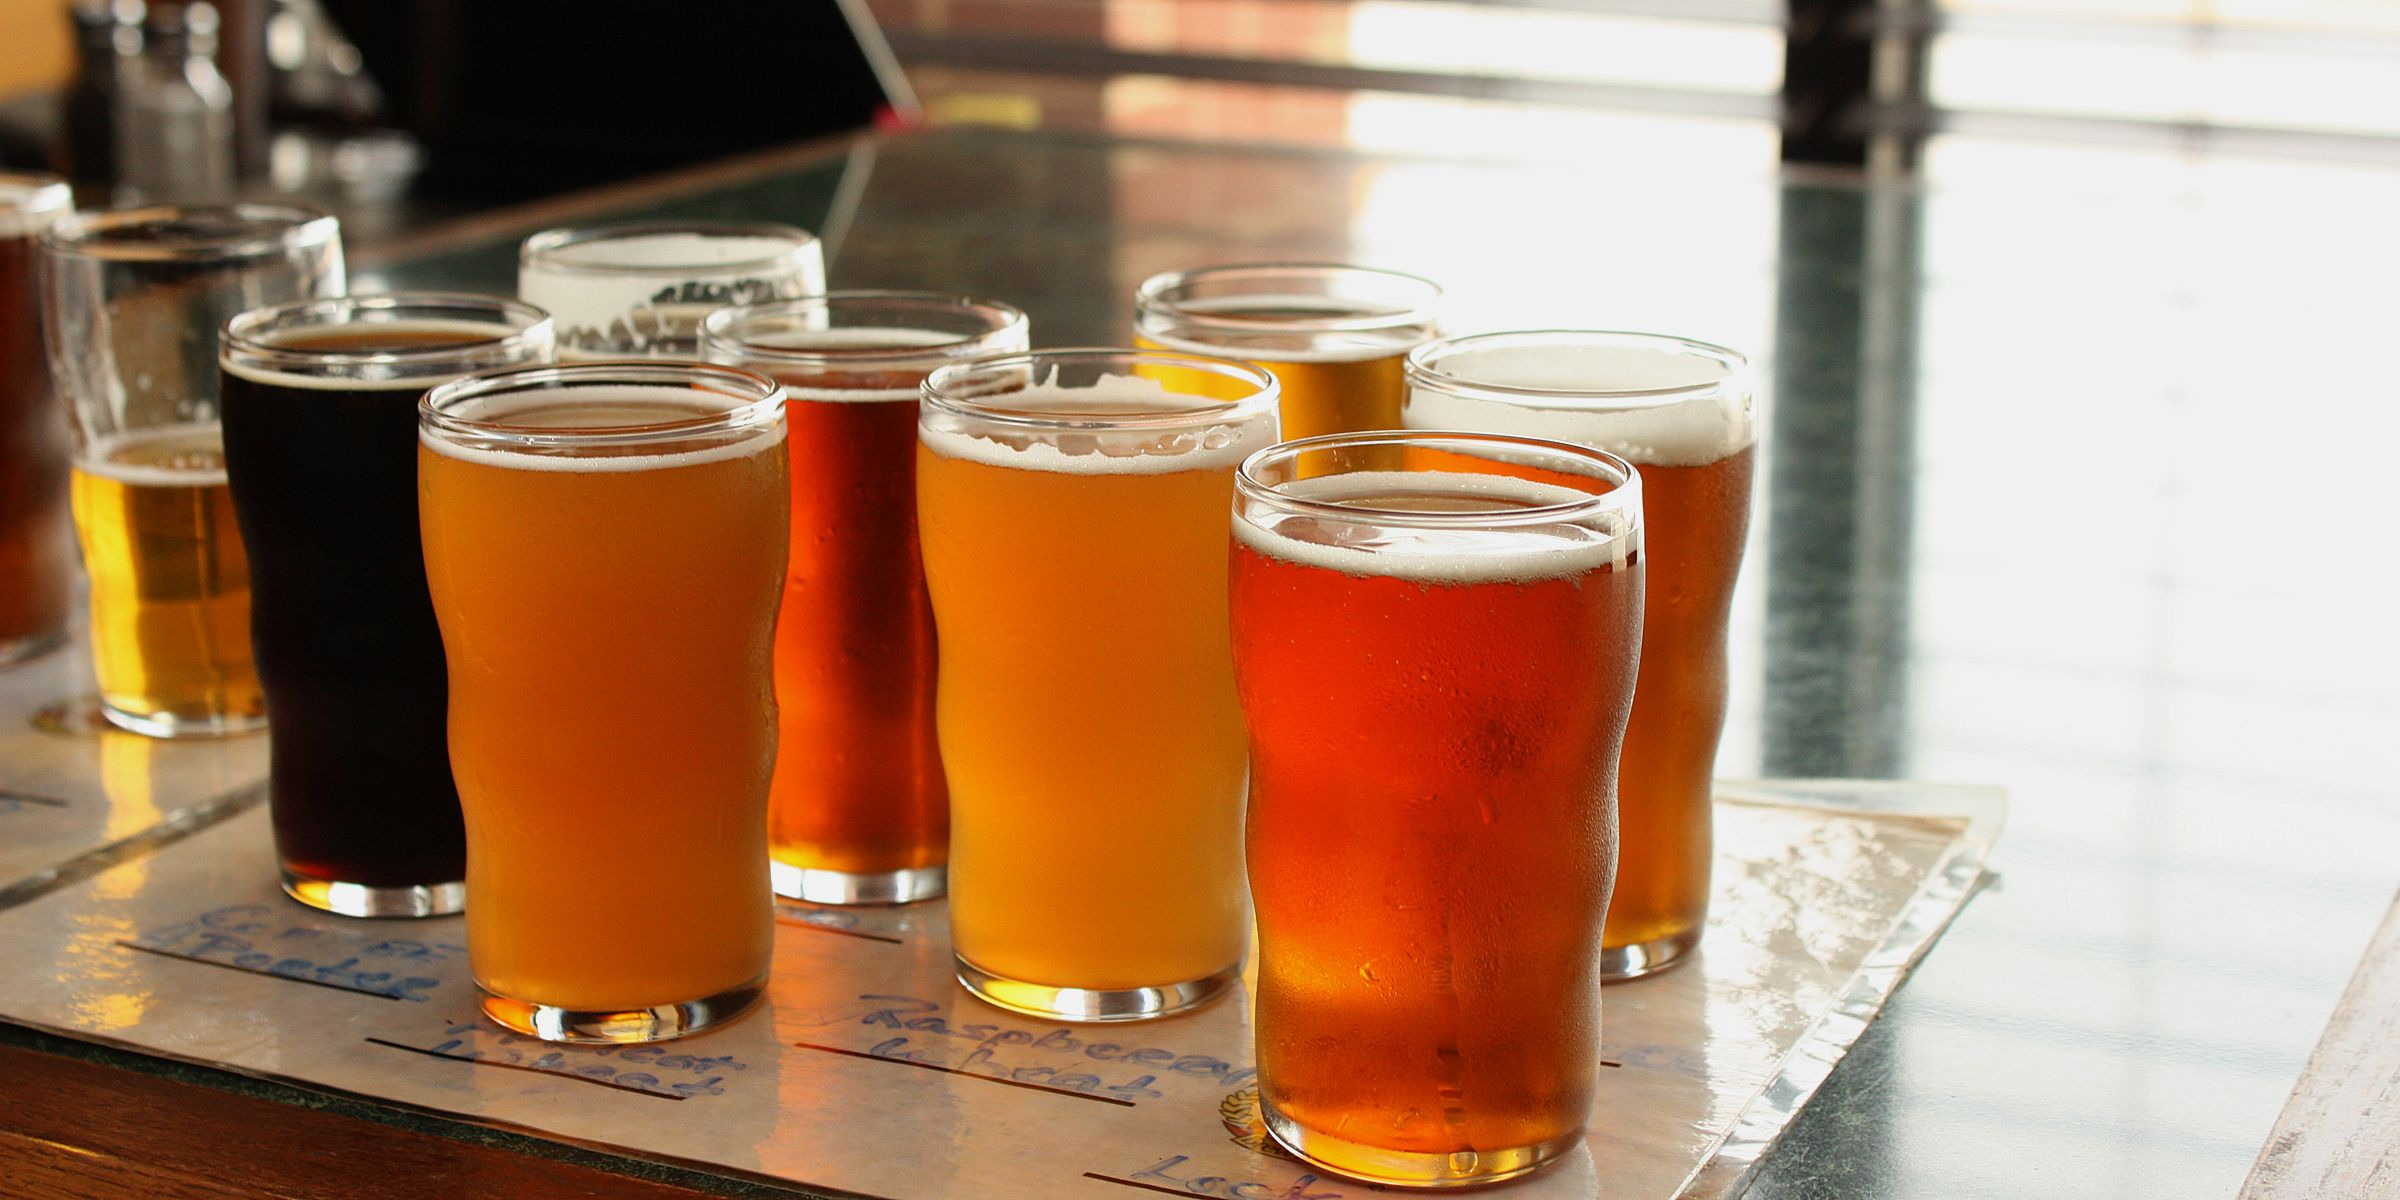 Delaware Beer Wine And Spirits Trail Beer Wine And Spirits Wine Club Membership